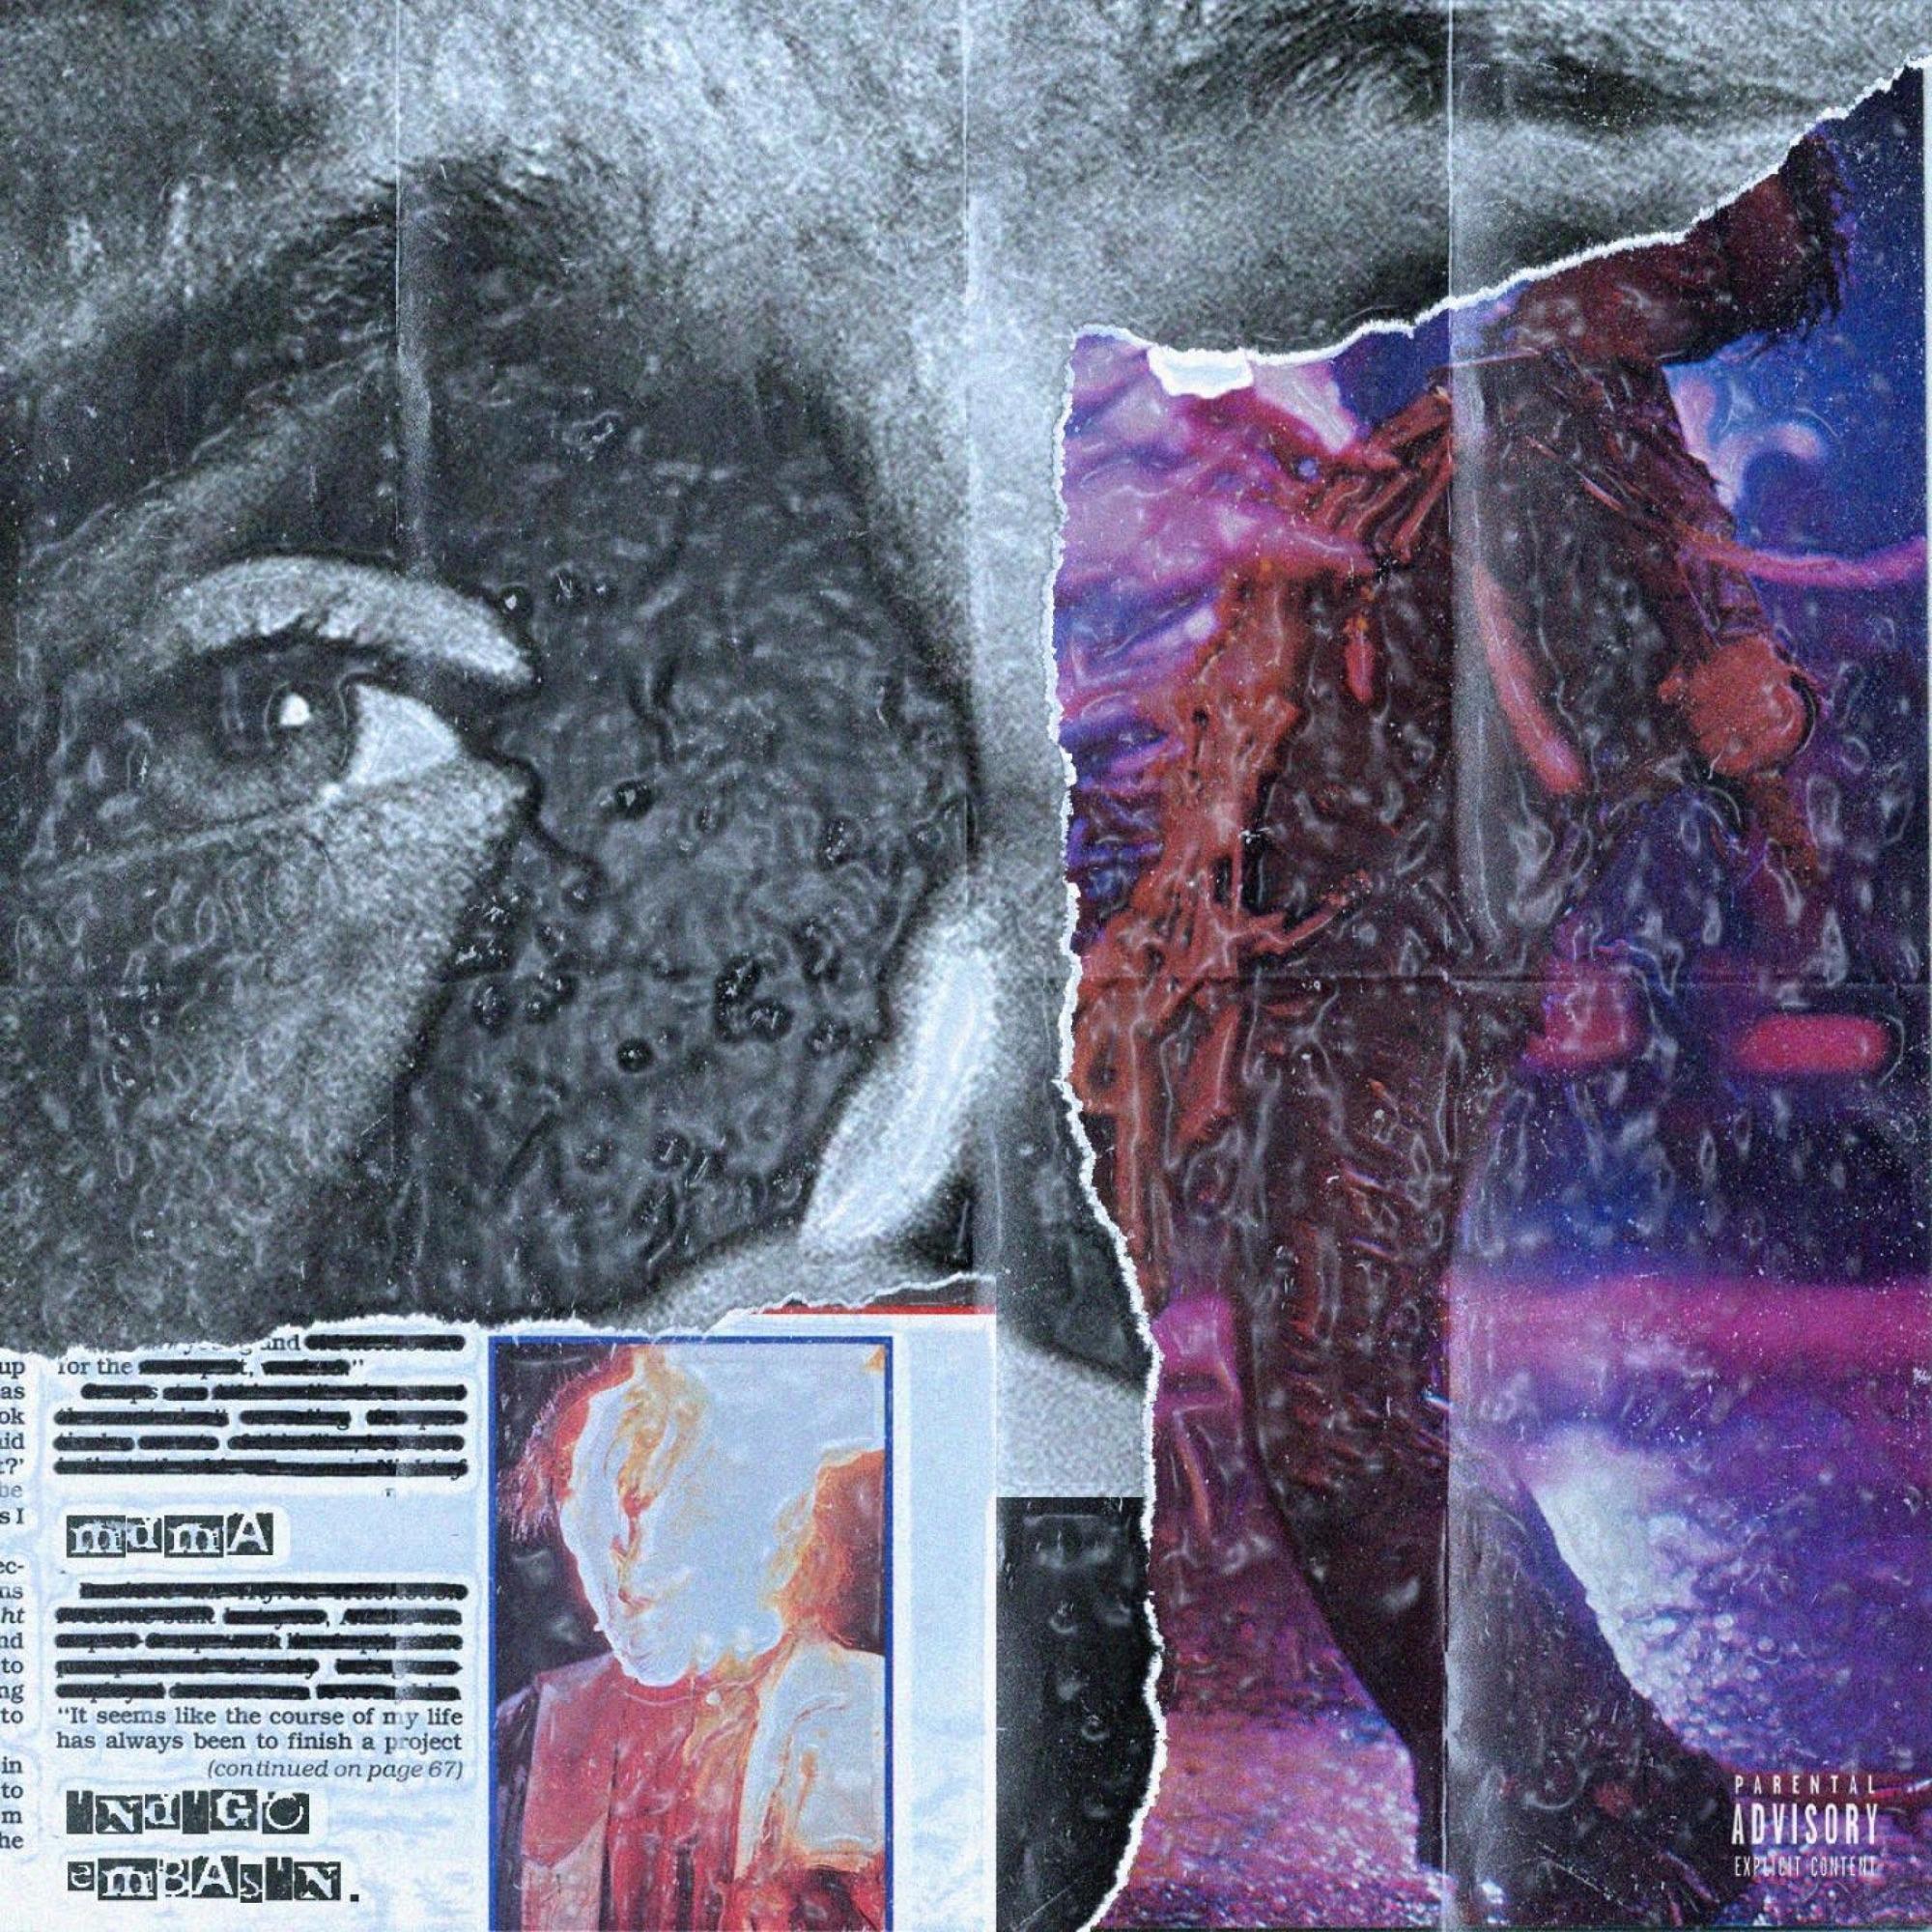 MDMA – Genie (Deluxe)